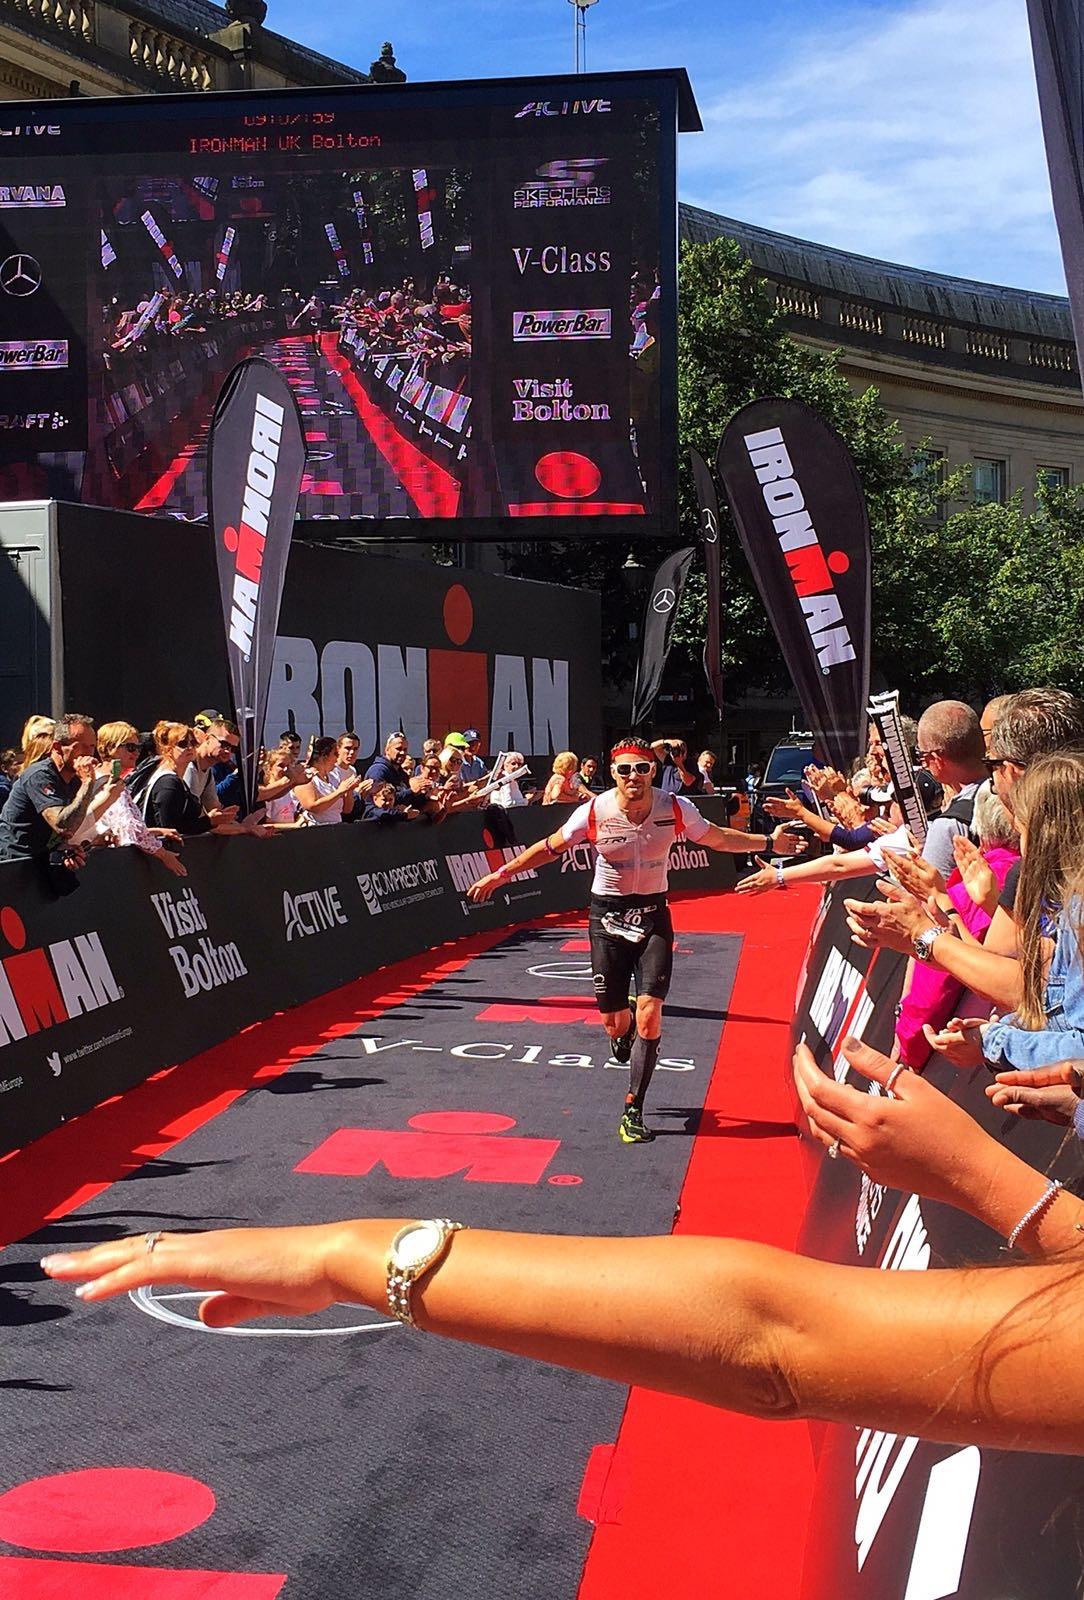 Brian has a brilliant Ironman — Rob runs back to back 1500m PB's — Dexta Wins Cracoe Fell Race